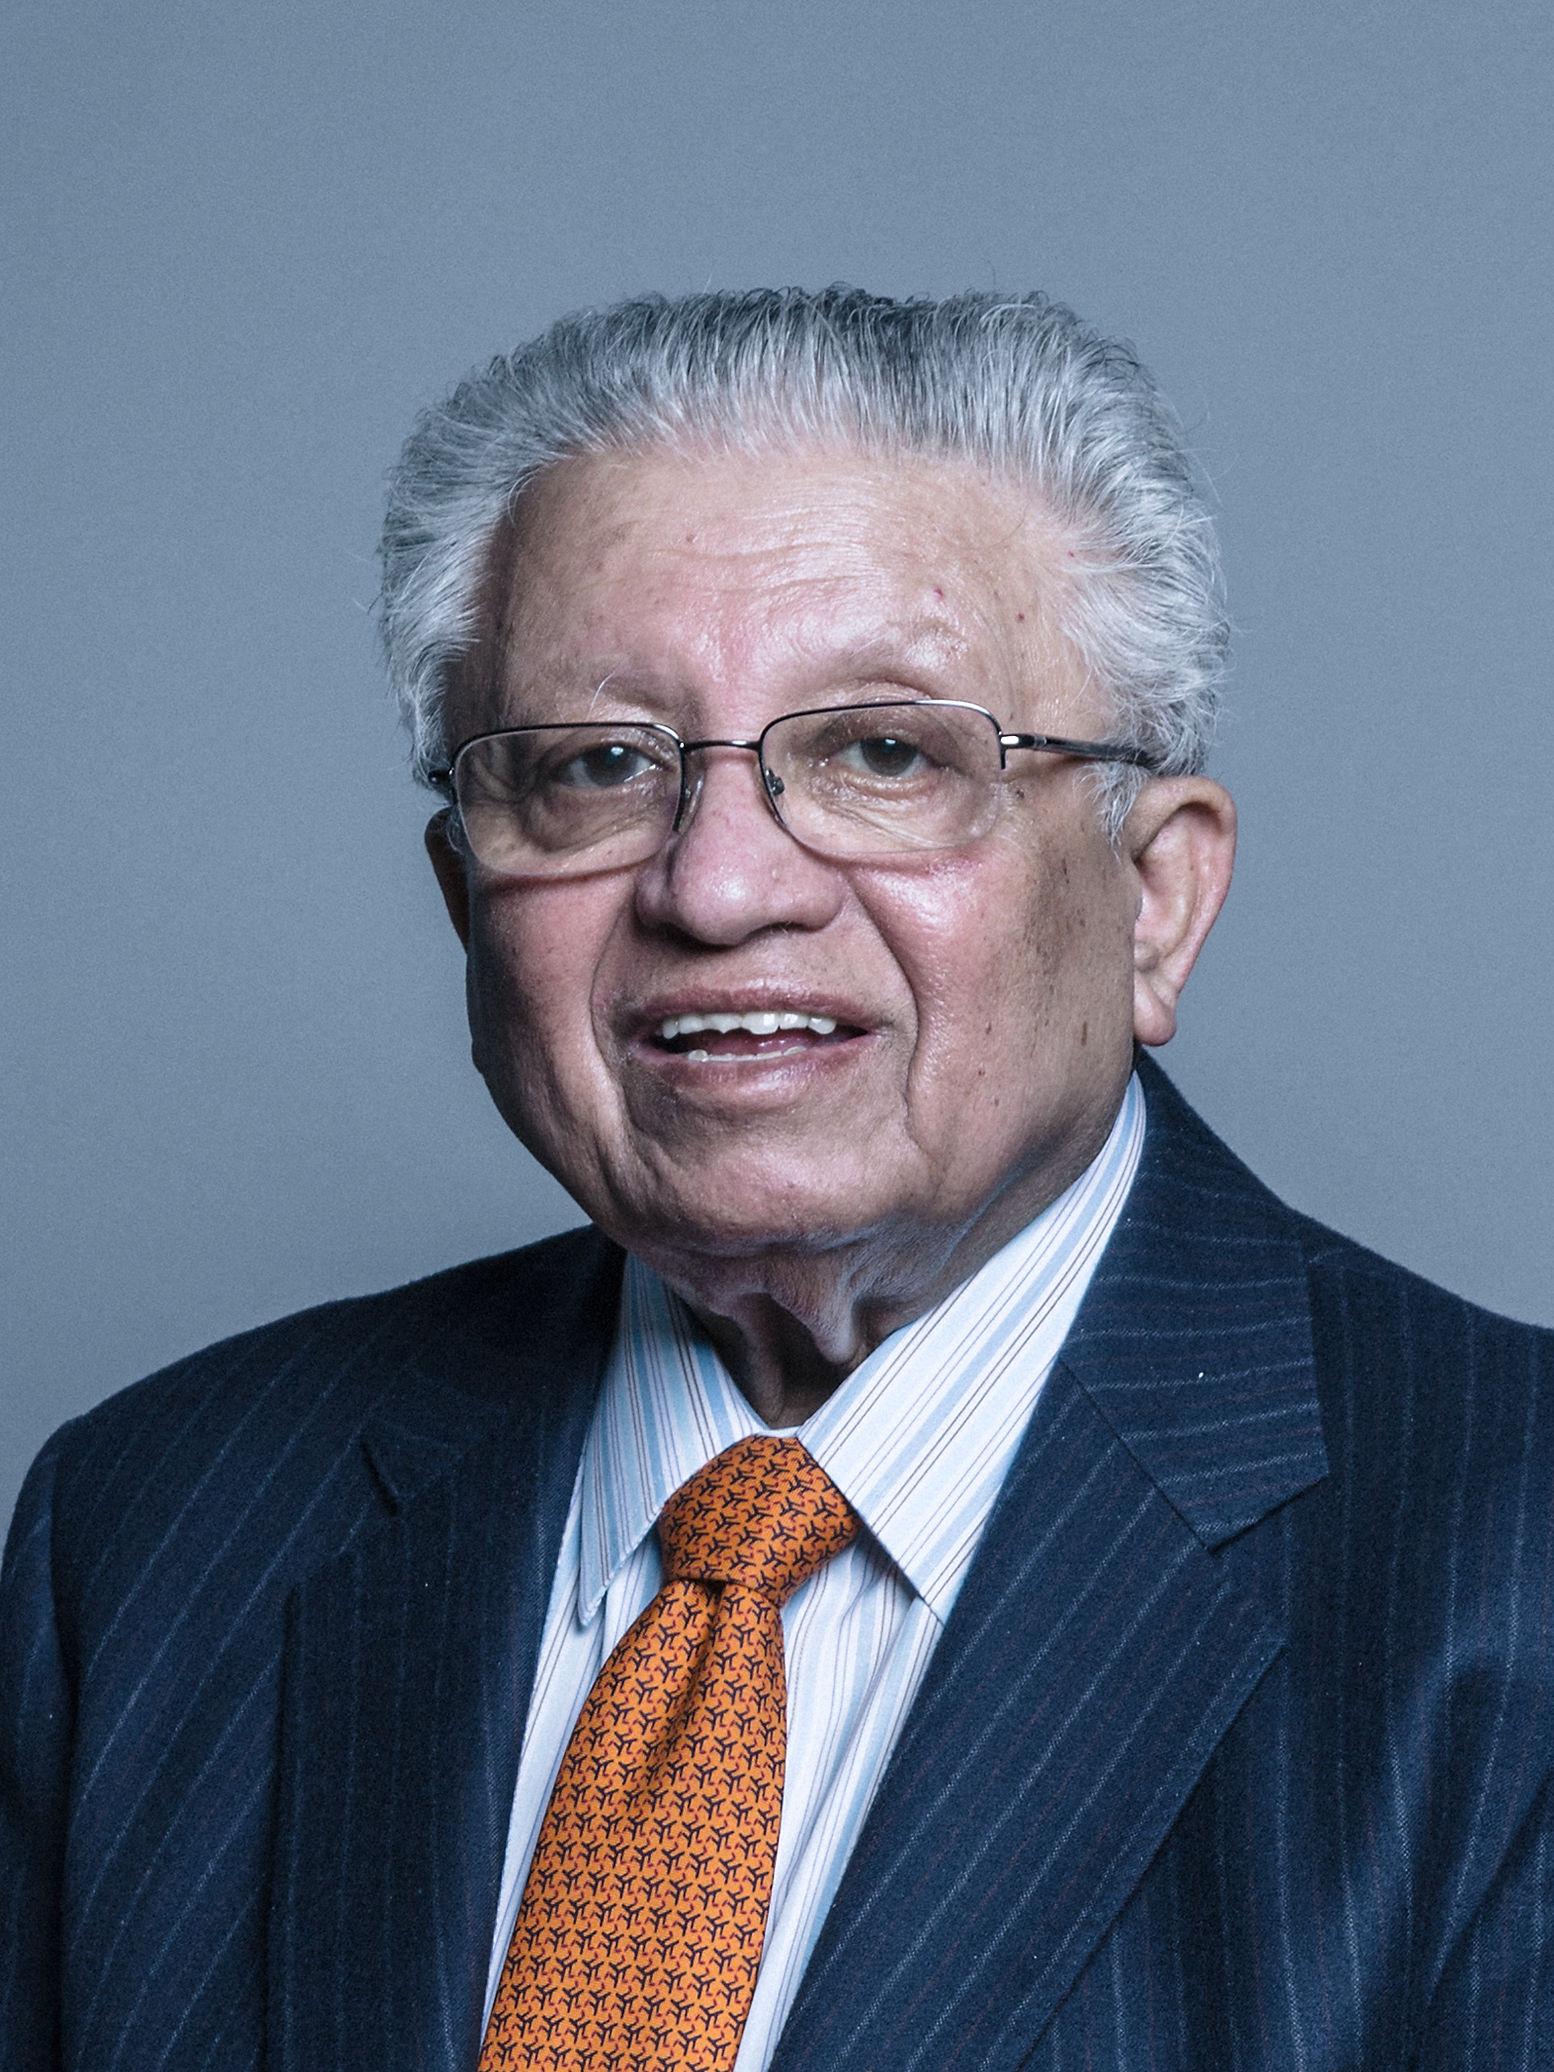 Kumar Bhattacharyya, Baron Bhattacharyya - Wikipedia